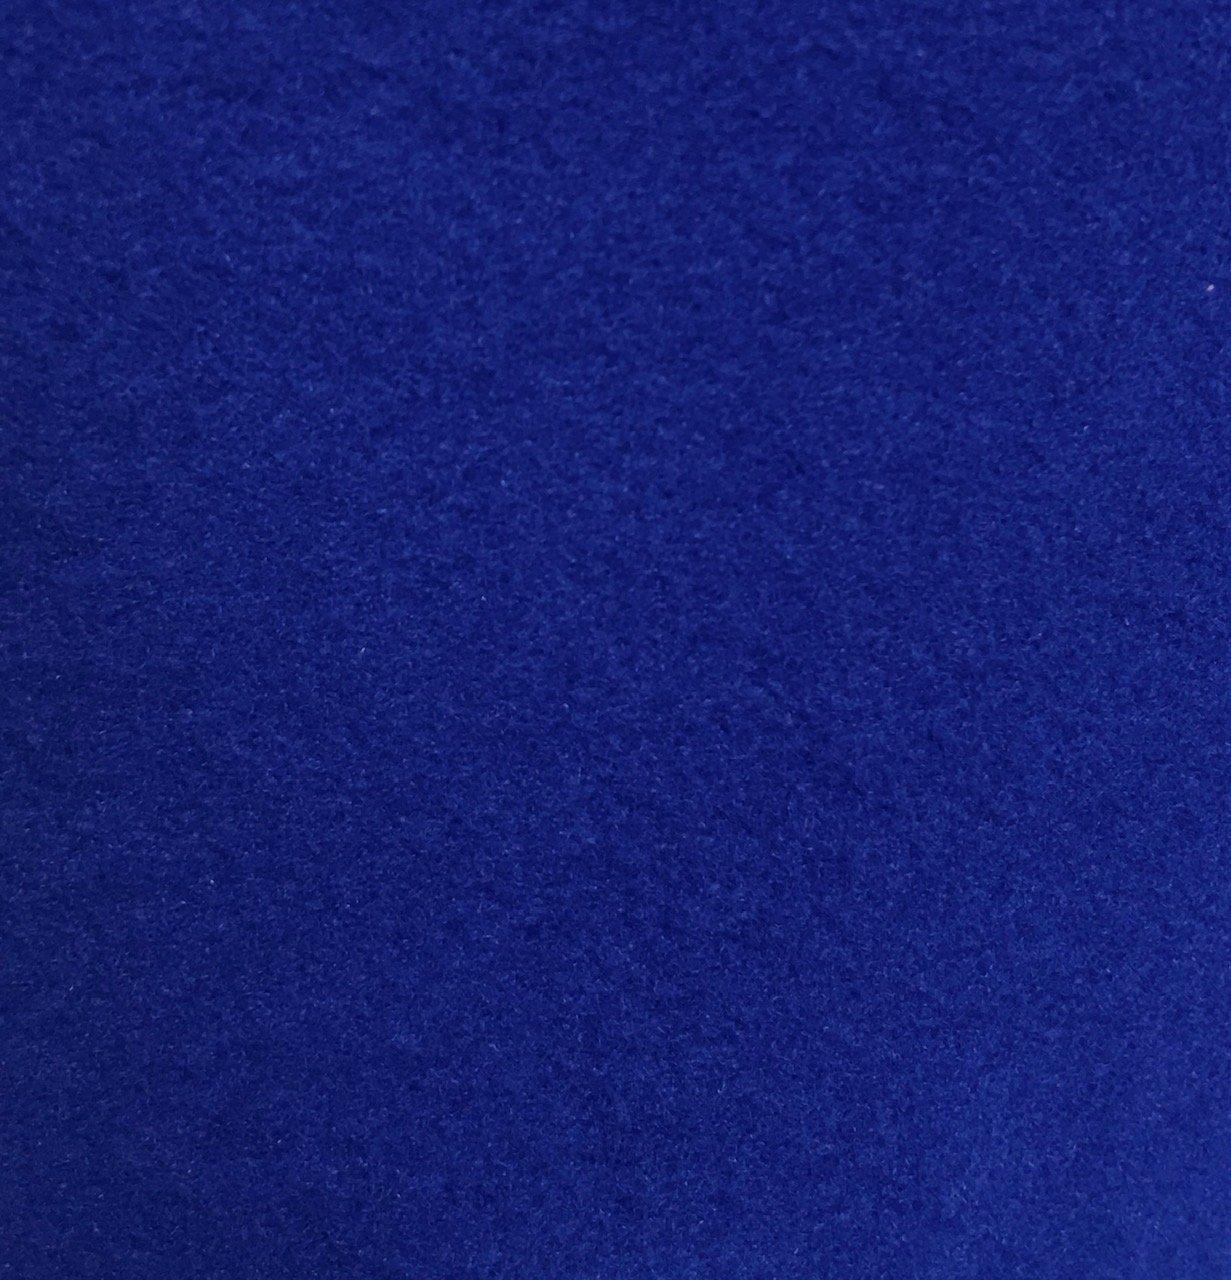 P200 - Royal Blue